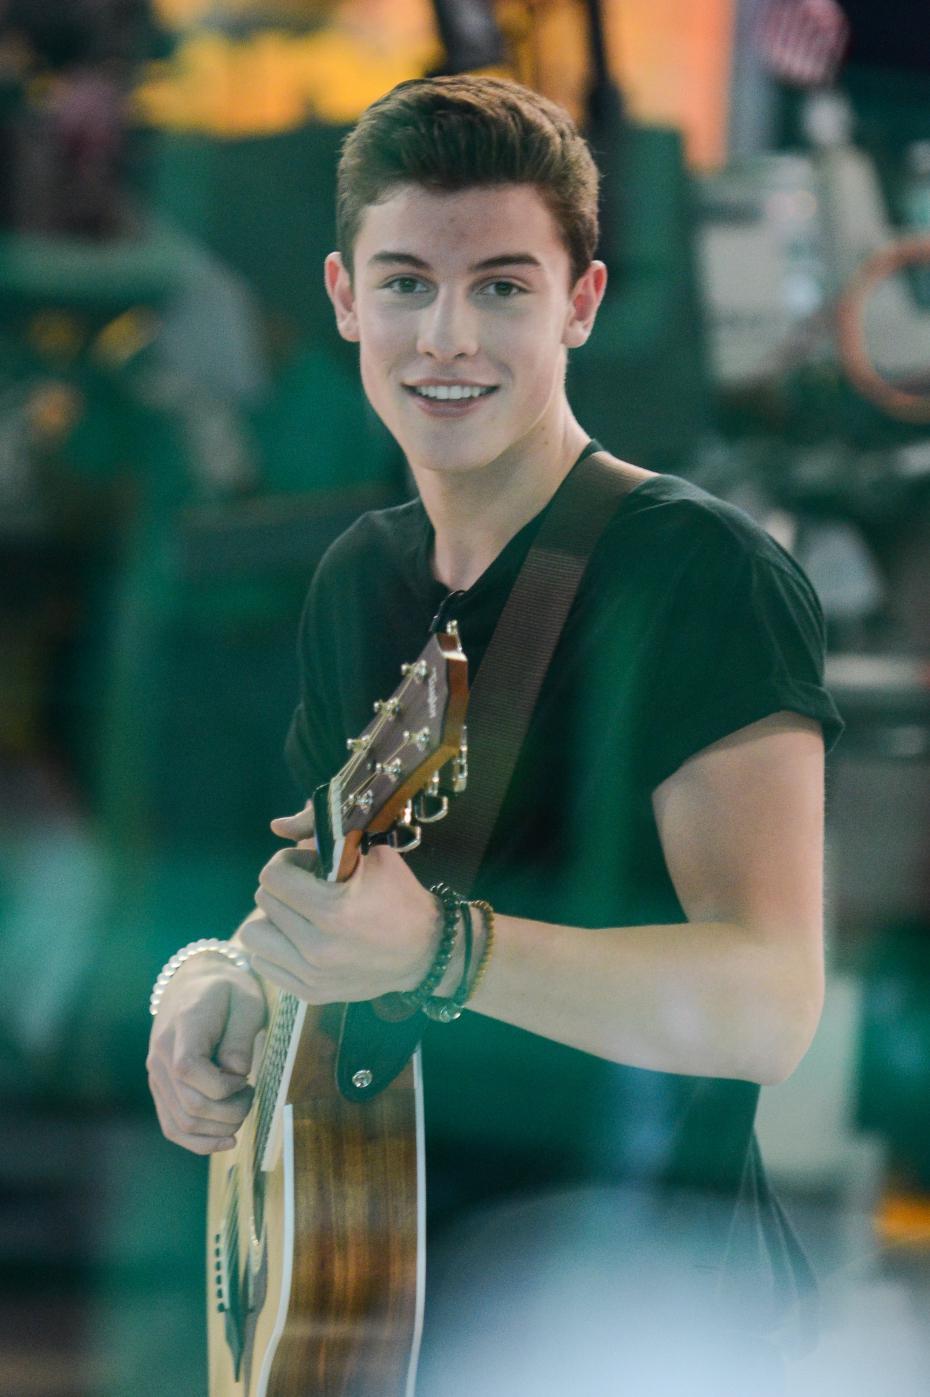 Oh canada guitar